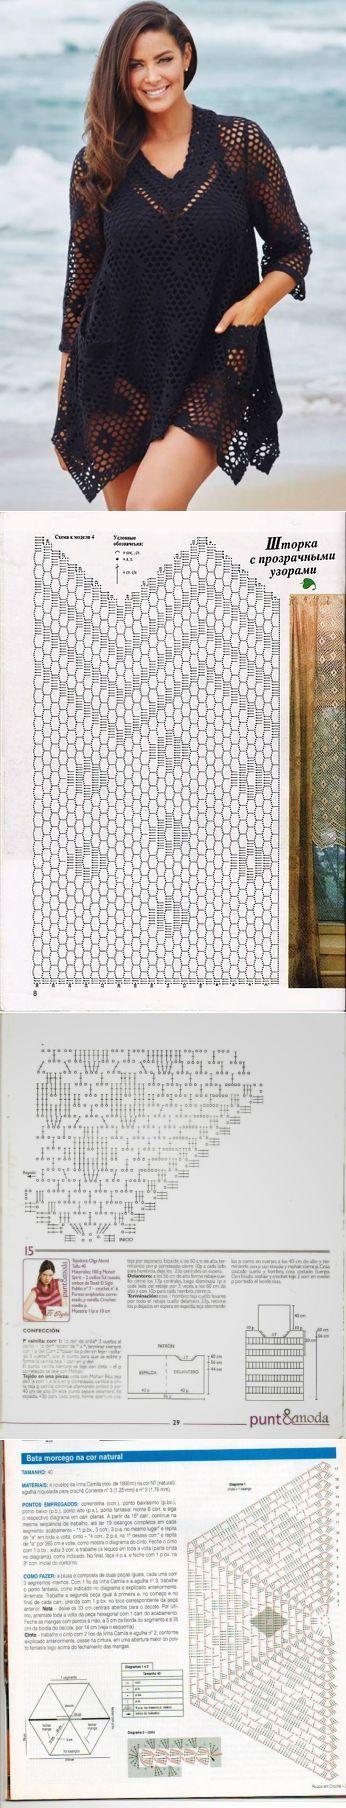 Mejores 174 imágenes de Crochet Clothes en Pinterest | Chaquetas ...